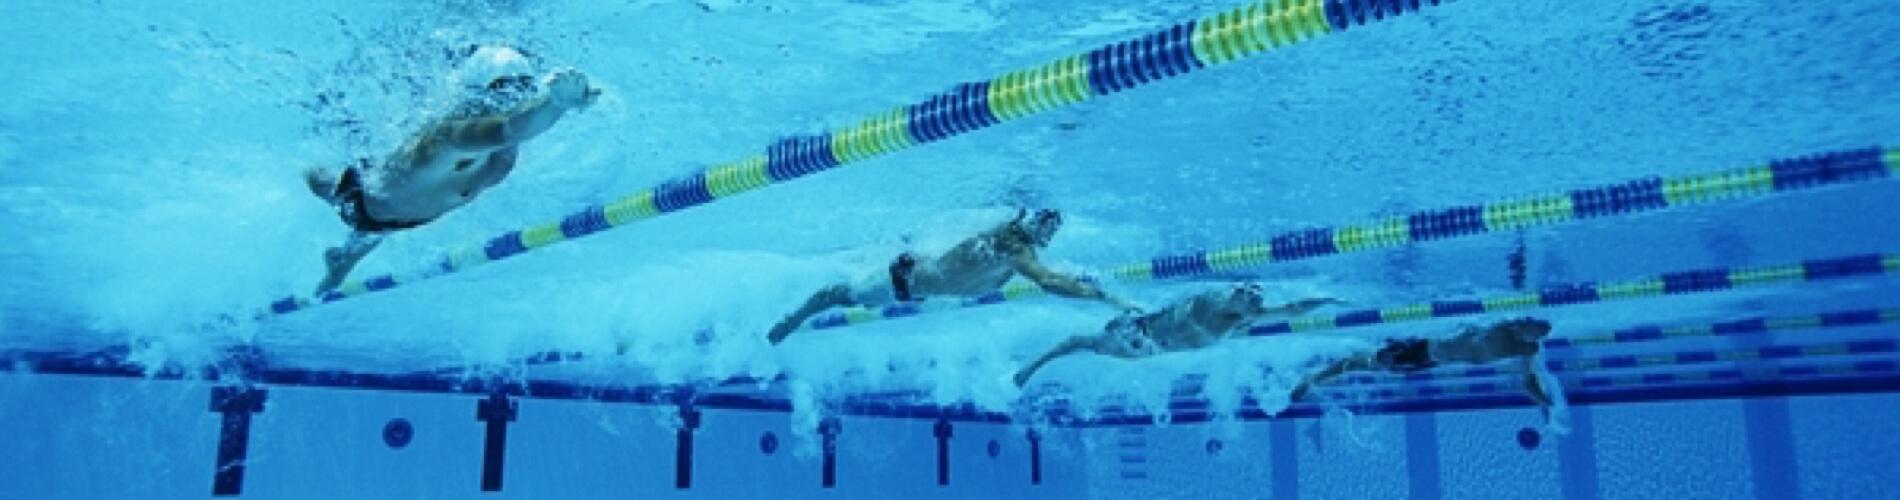 Swim.it Cloud Evaluation feature image